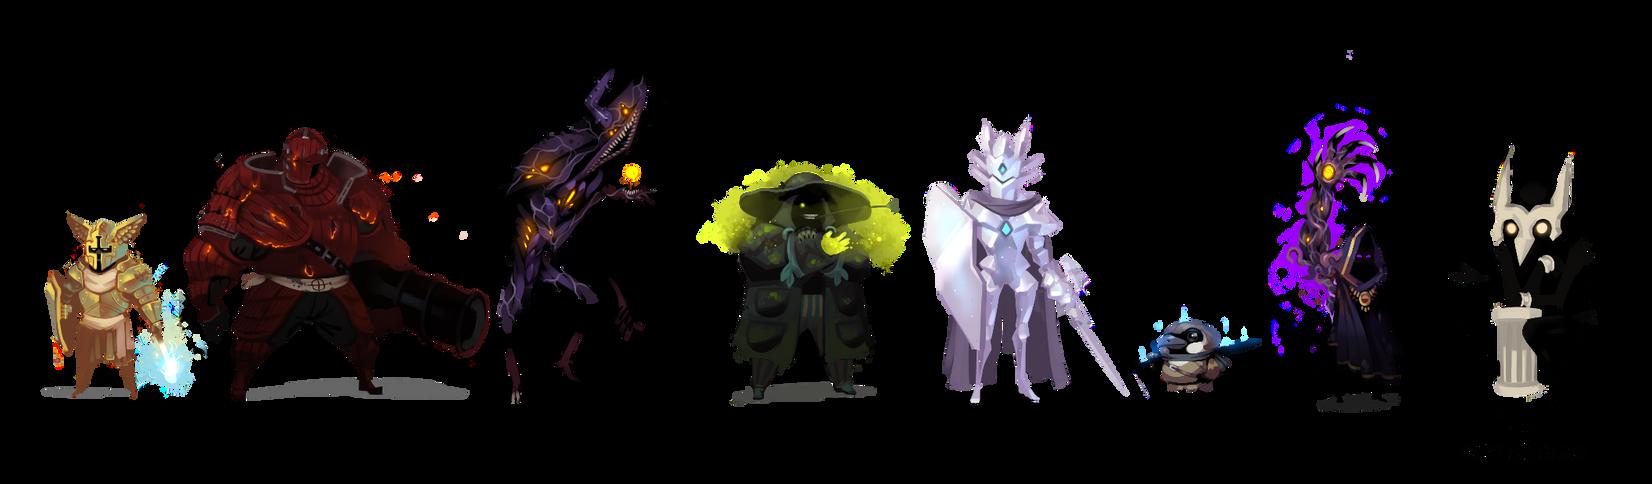 Some familiar faces.